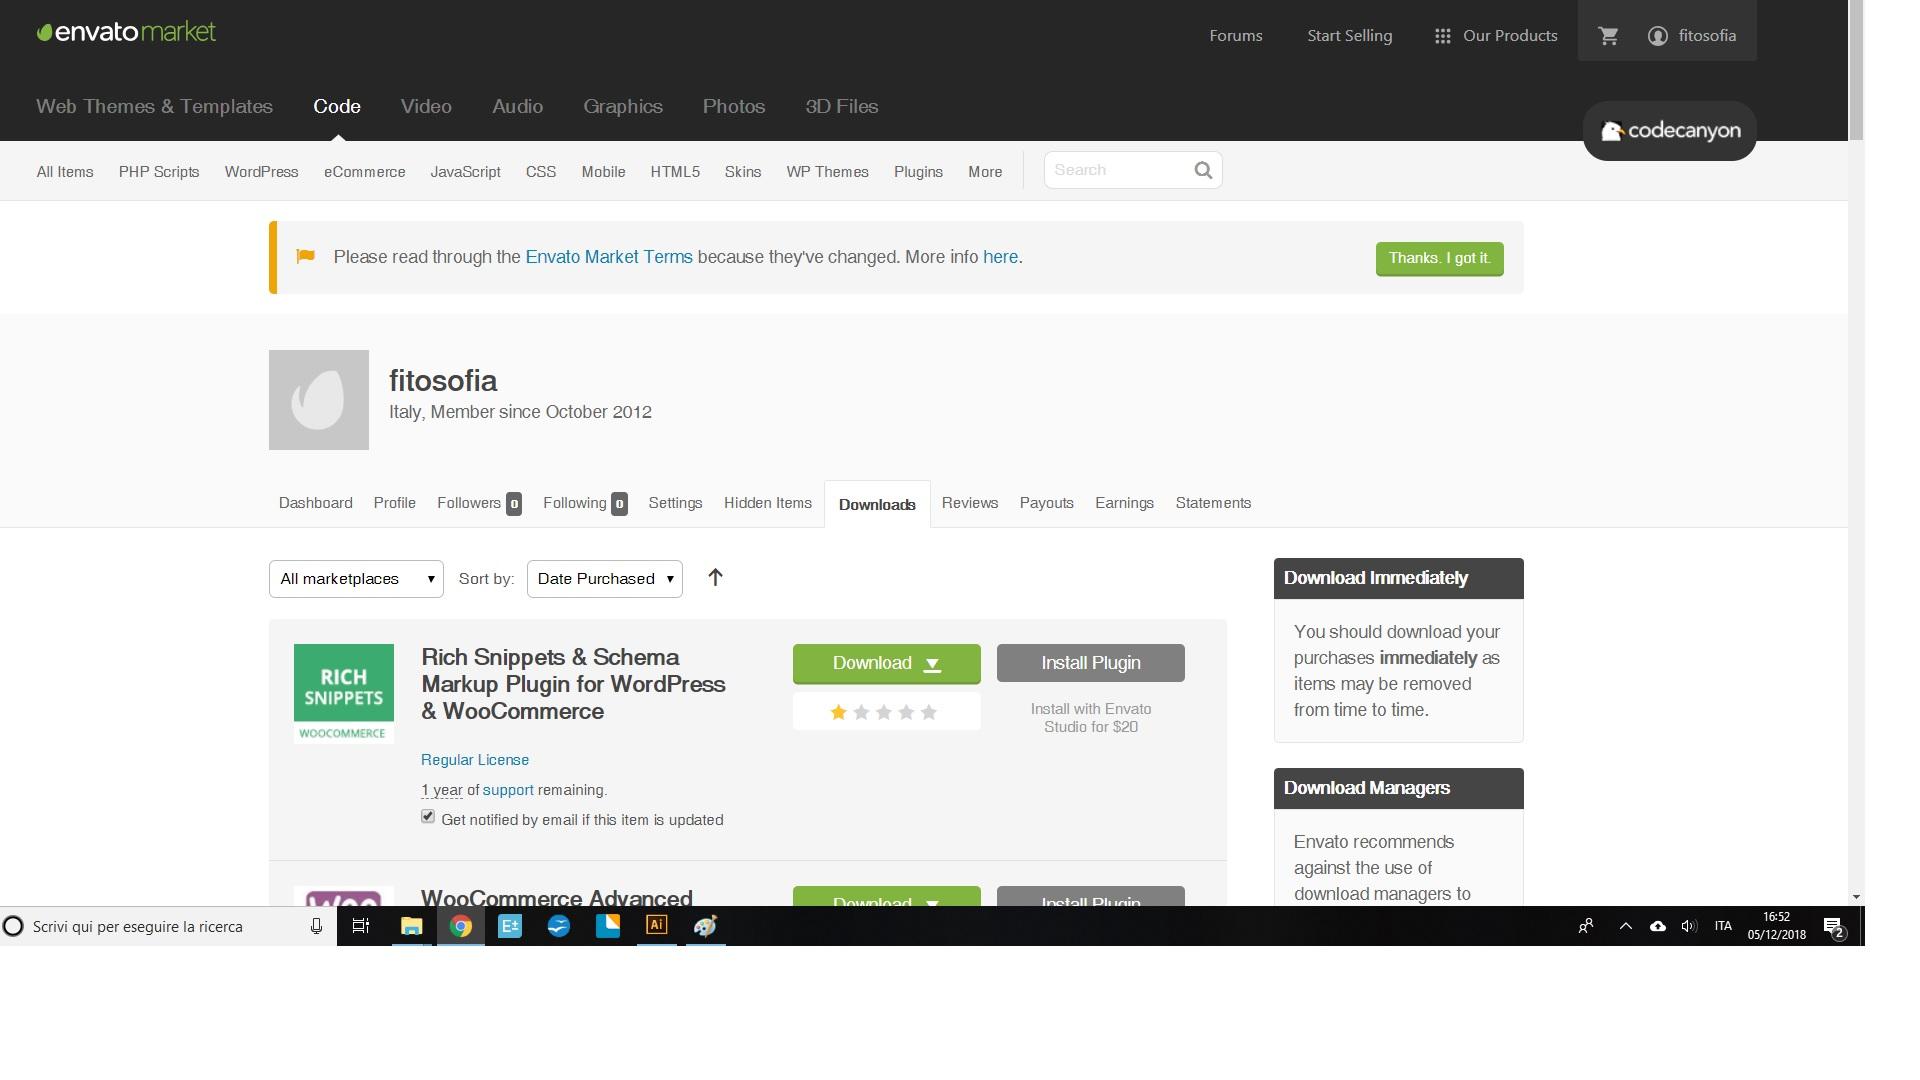 CodeCanyon net Reviews - 24 Reviews of Codecanyon net | Sitejabber